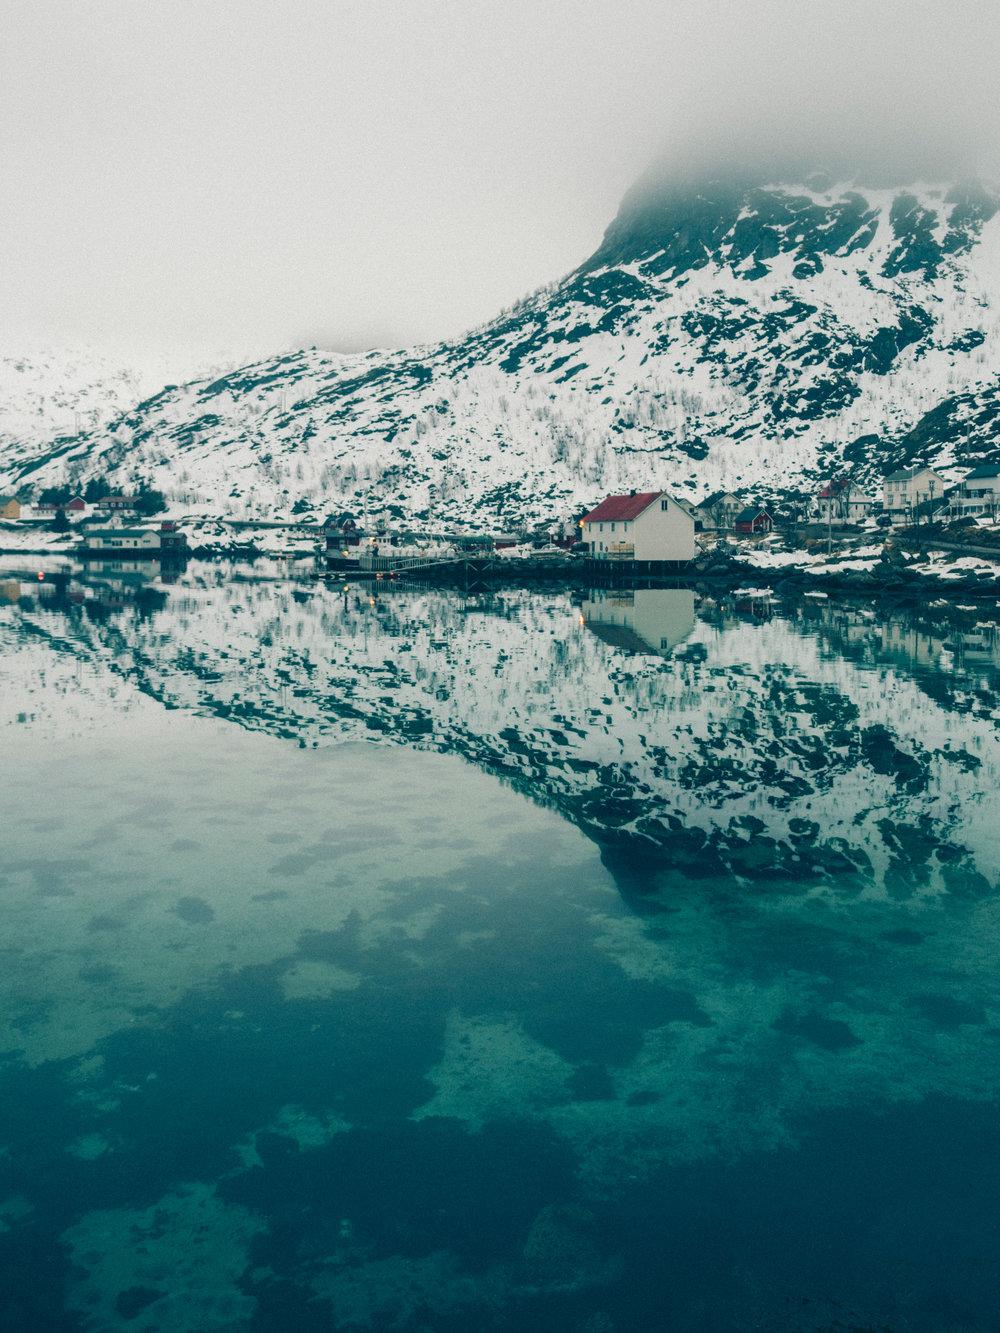 hamnoy-house-reflection-water-lofoten